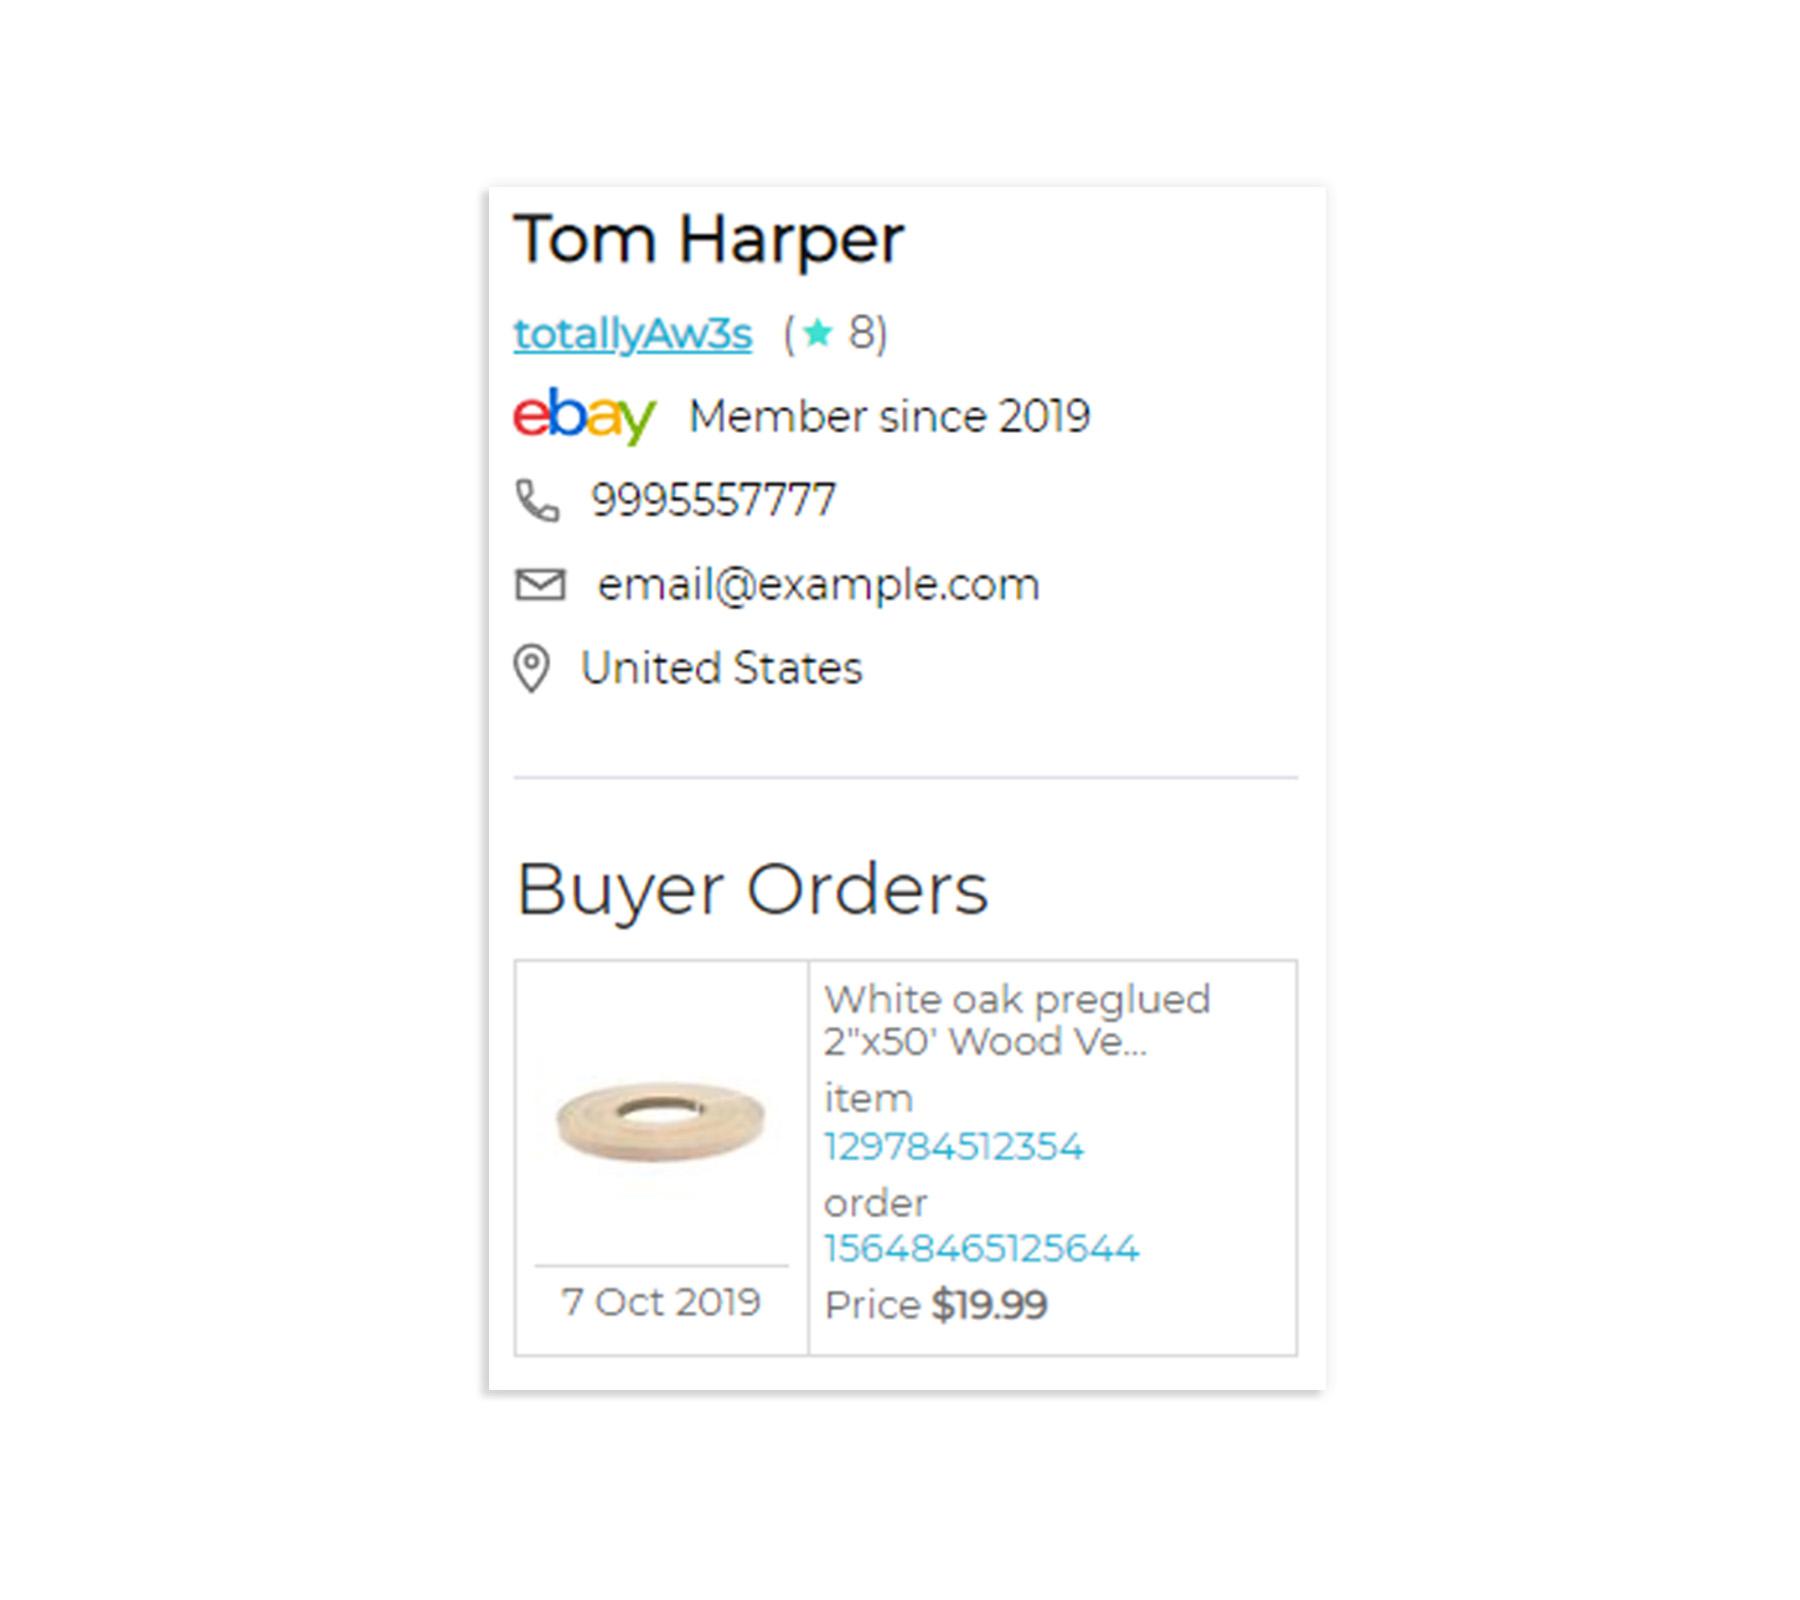 Ebay Messages Crm Helpdesk Manage Communication